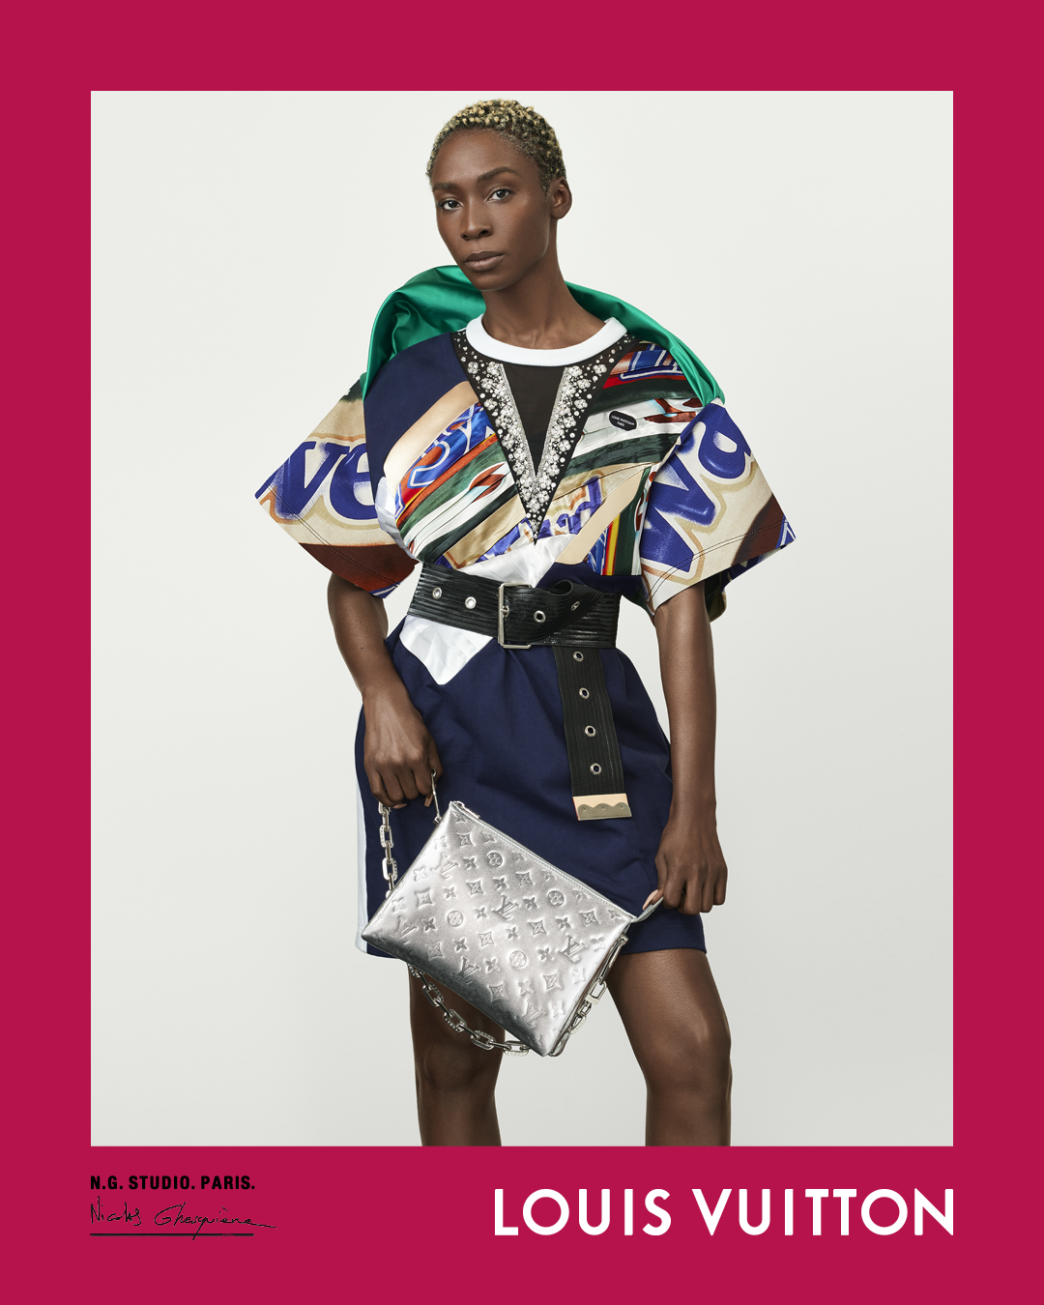 Эмма Стоун, Софи Тернер и другие звезды снялись в рекламе Louis Vuitton (ФОТО) - фото №6